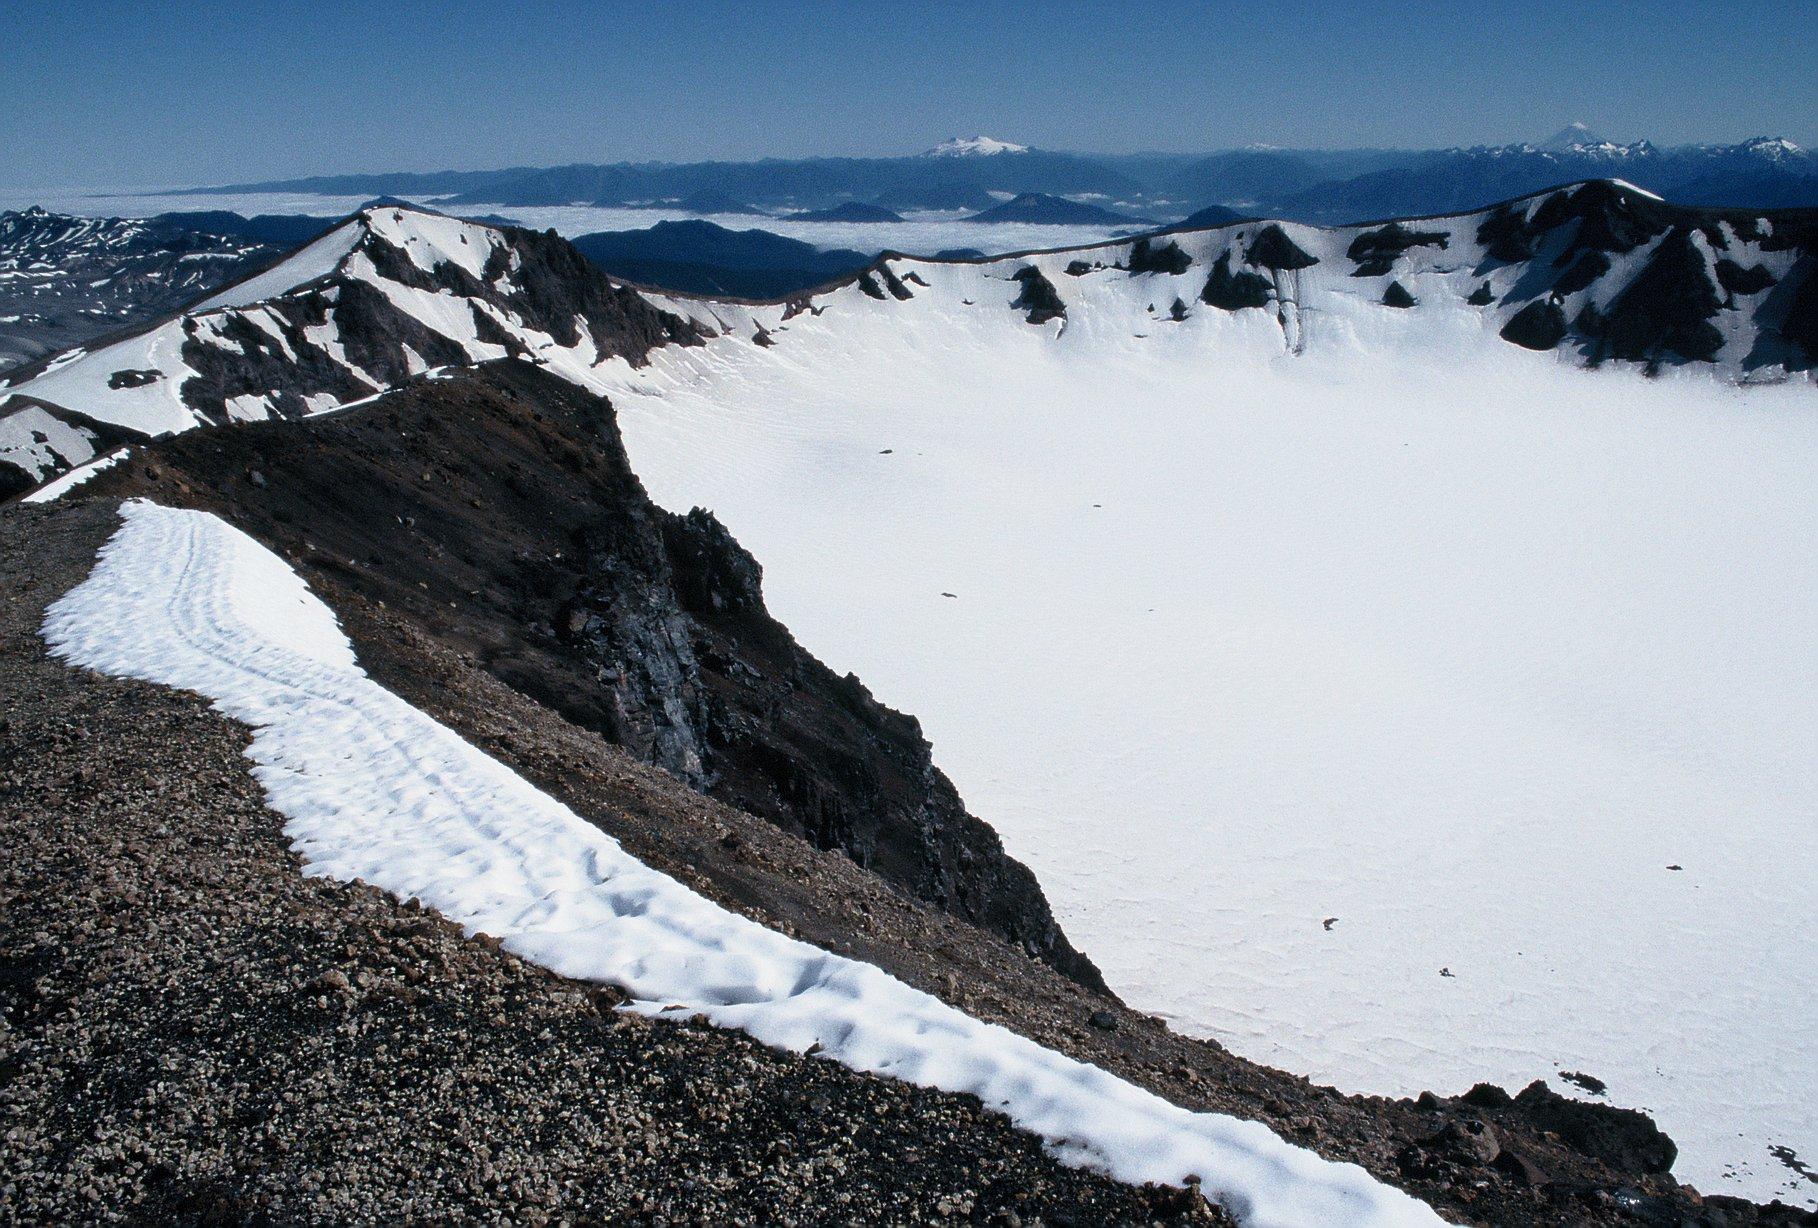 Volcanic calderas of Chile